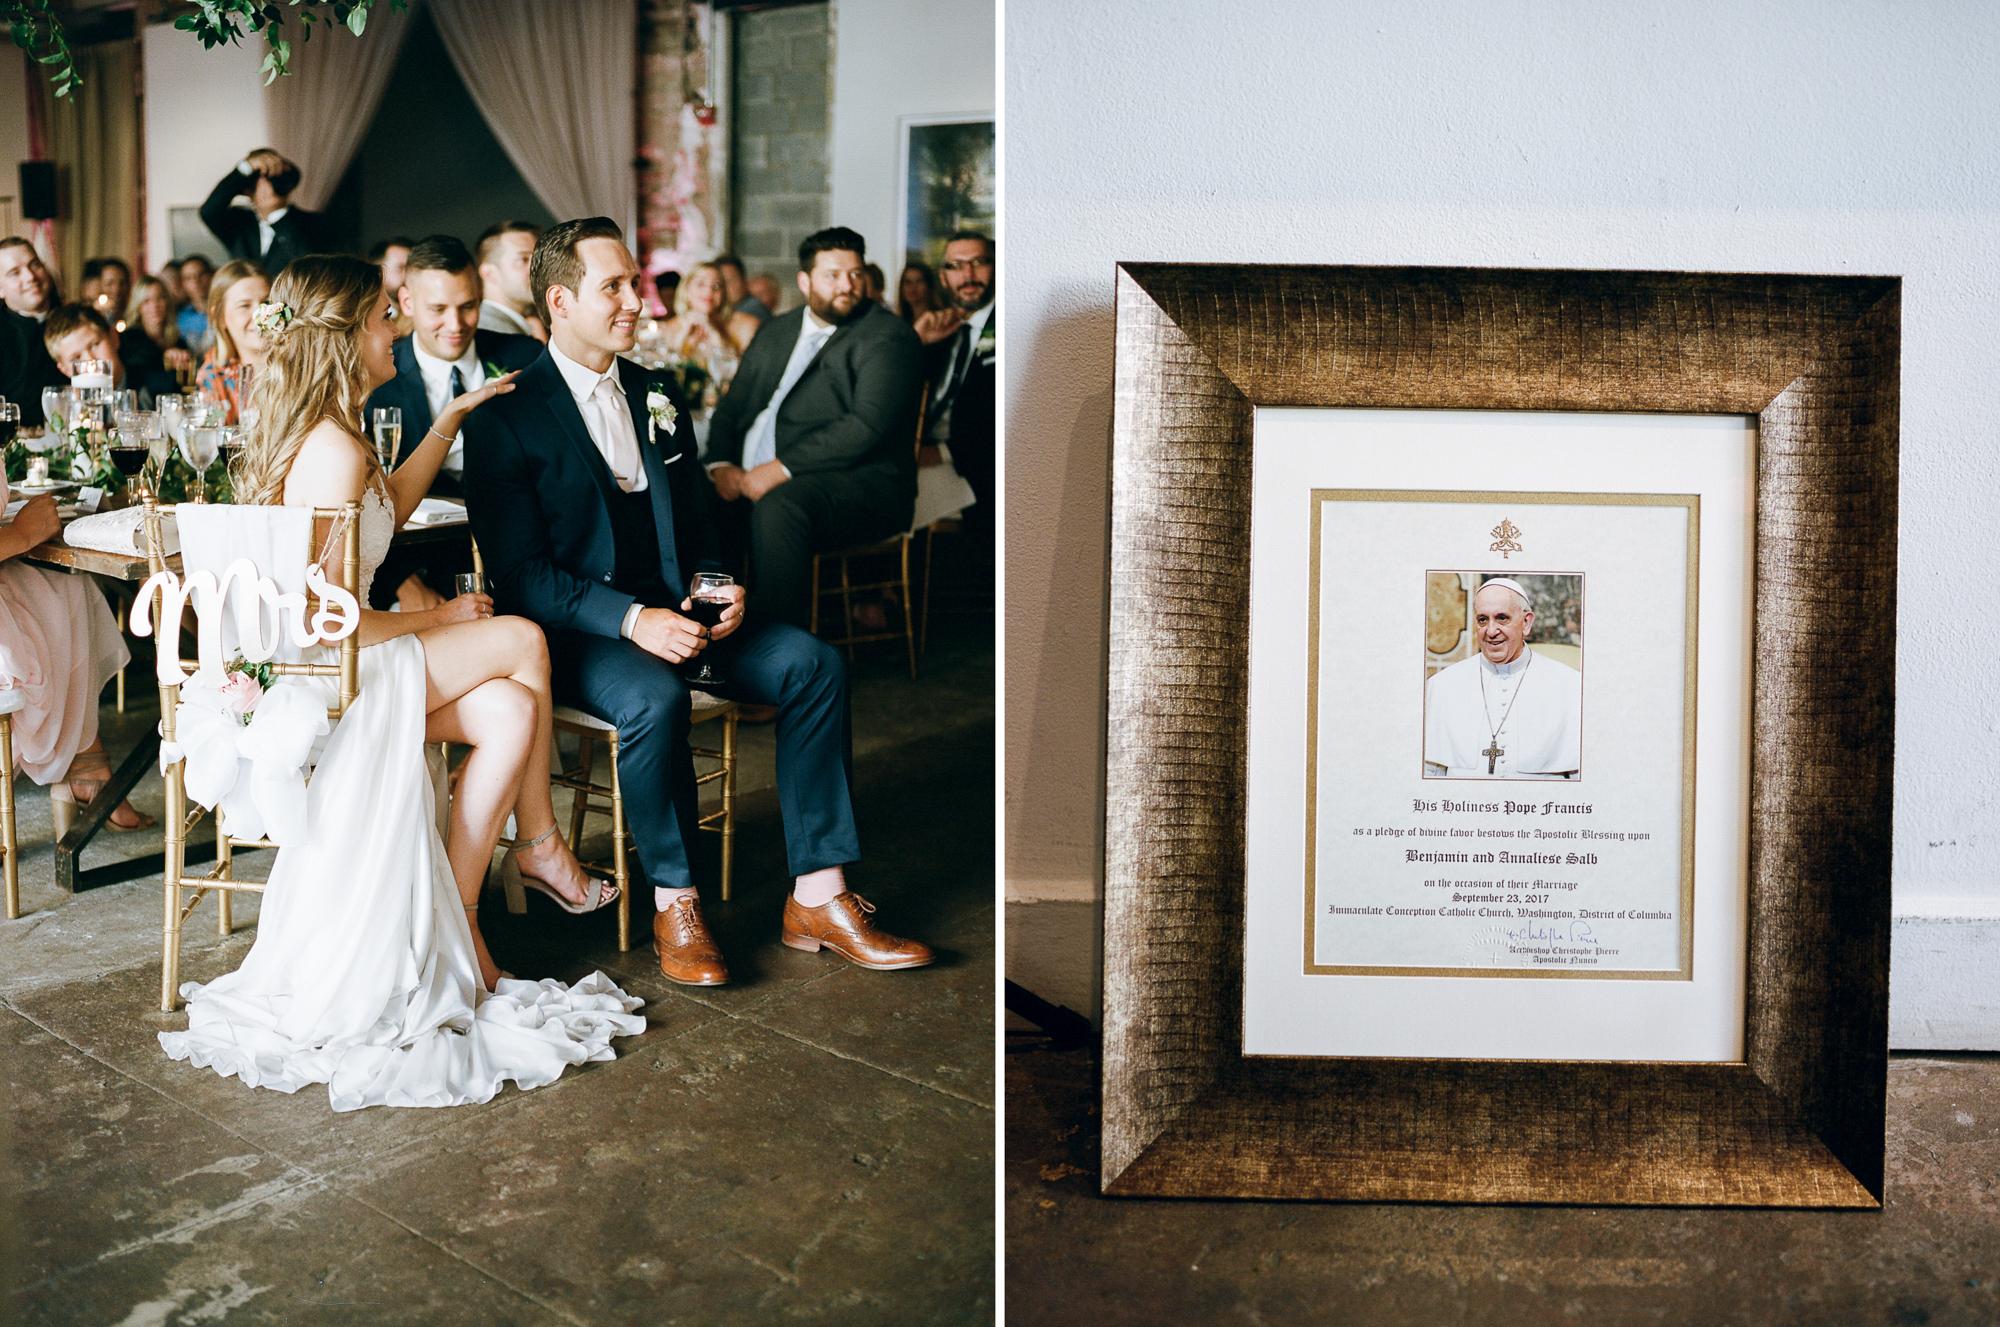 LongView-Gallery-Wedding-Art-Washington-DC-Film-Photographer-53.jpg